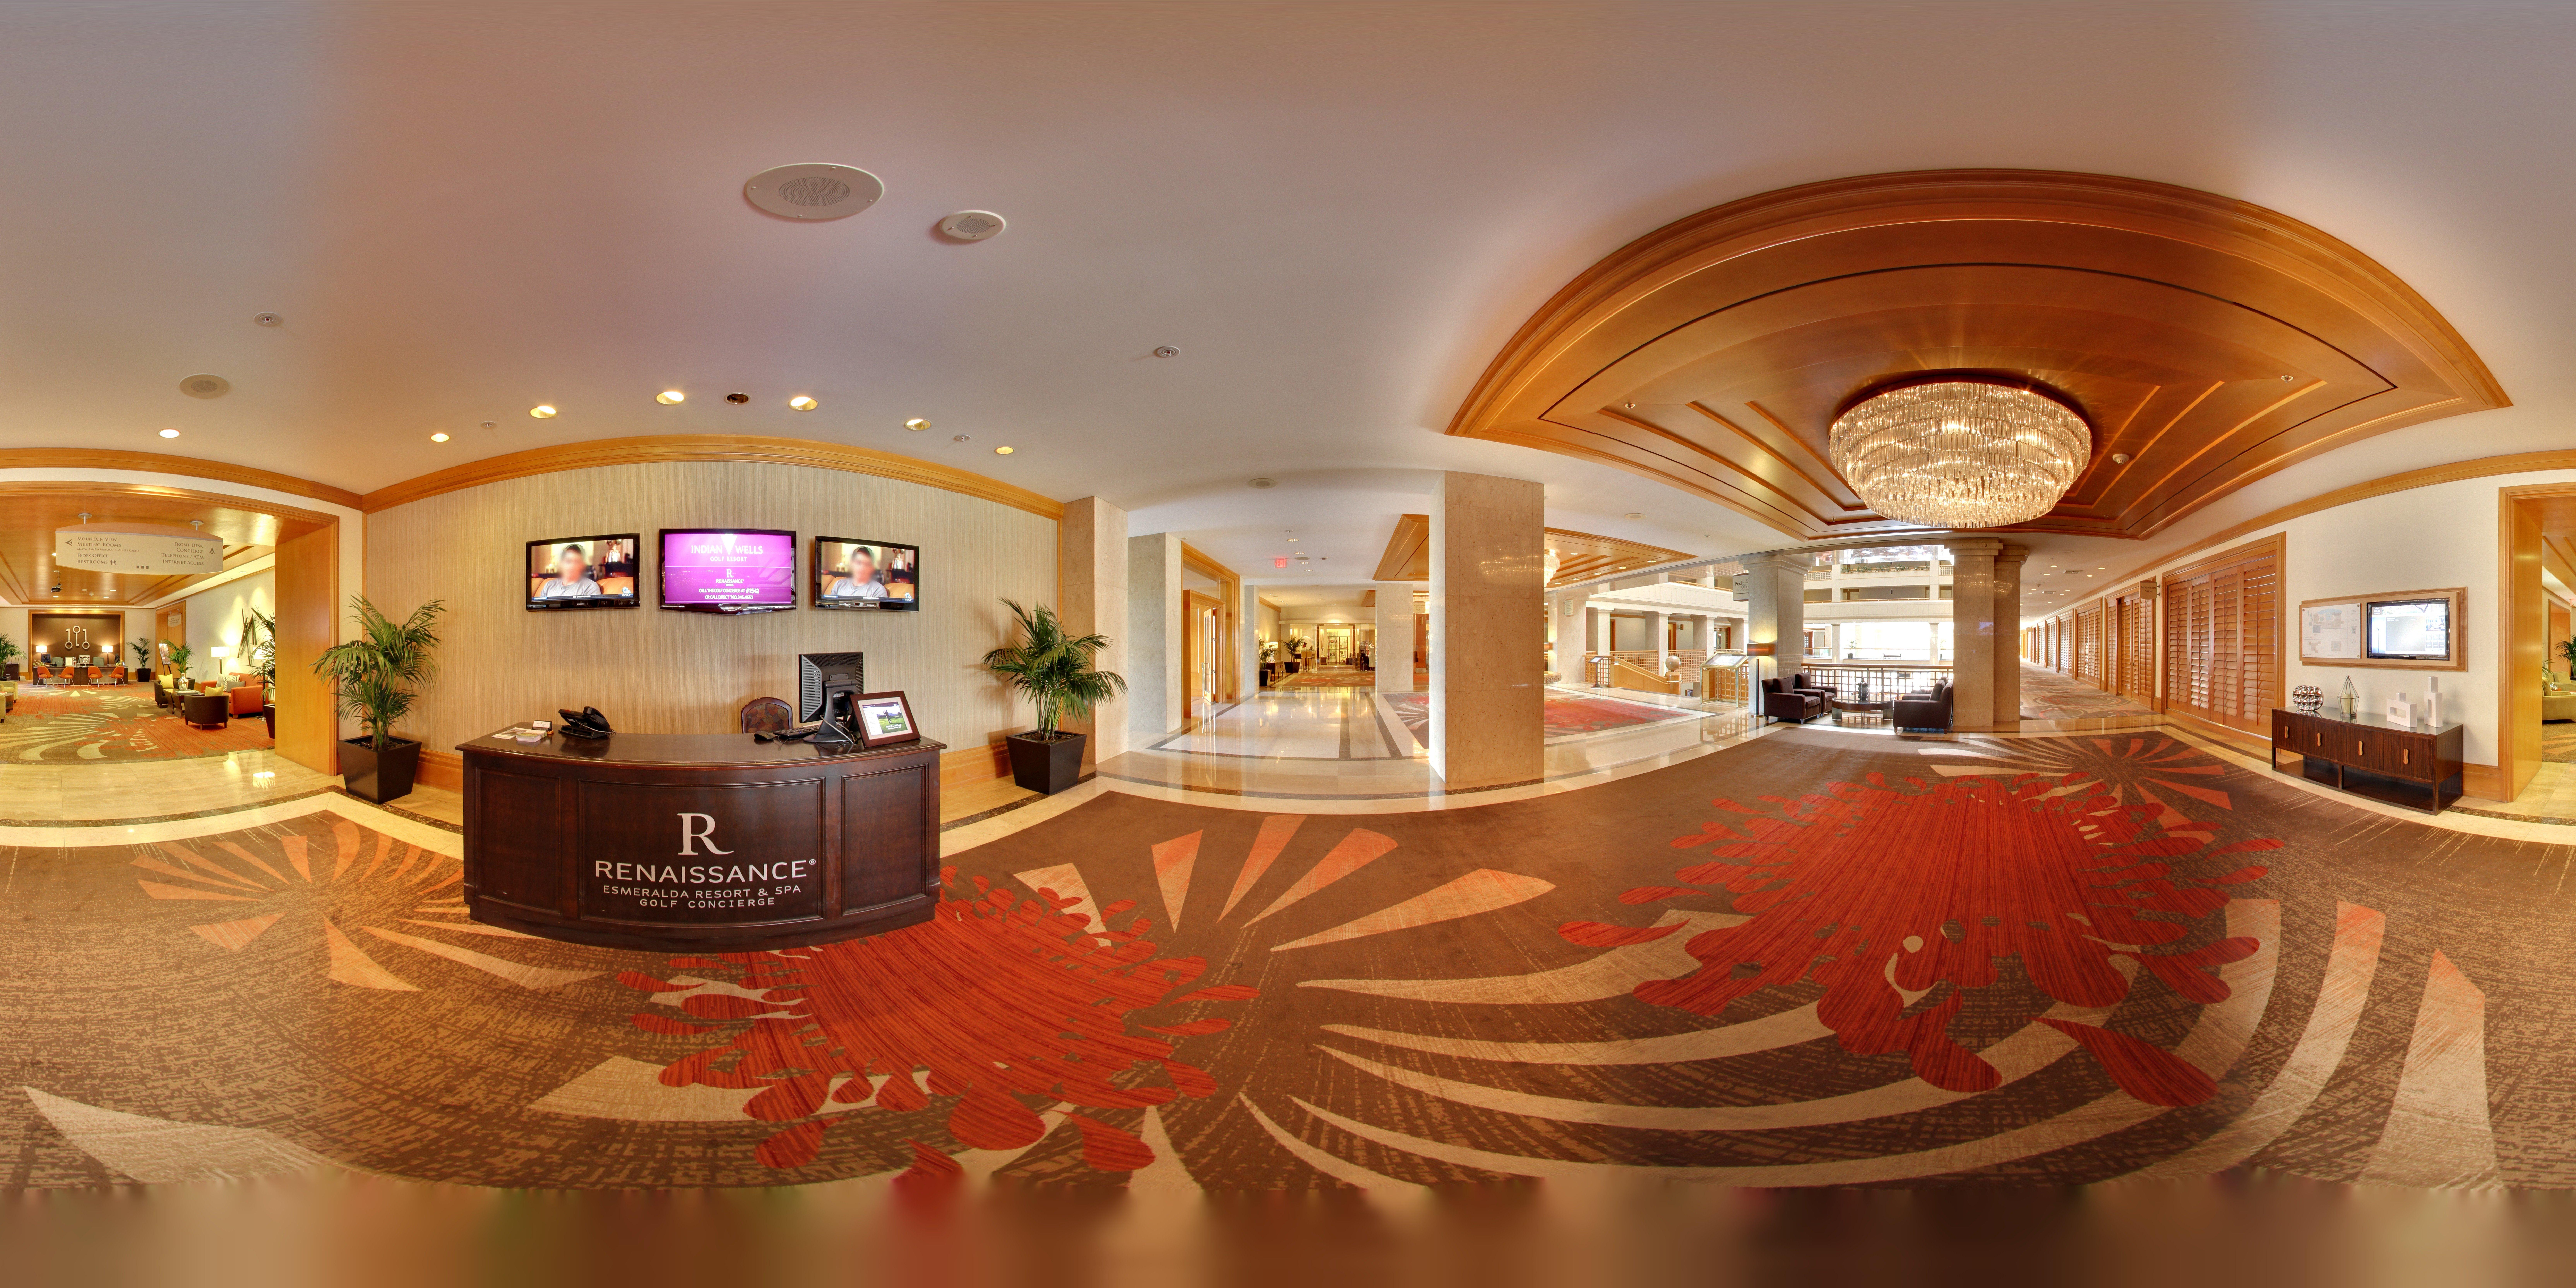 Renaissance Indian Wells Resort & Spa image 70